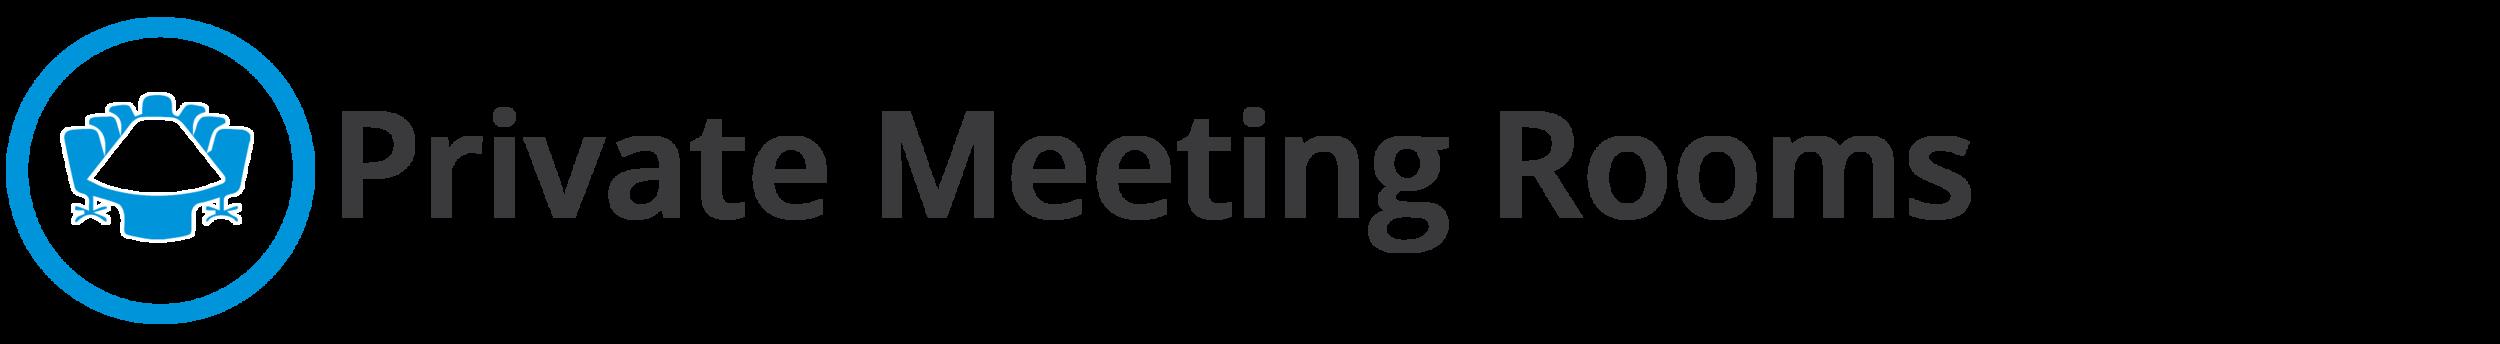 Meetingrooms_text-01.png